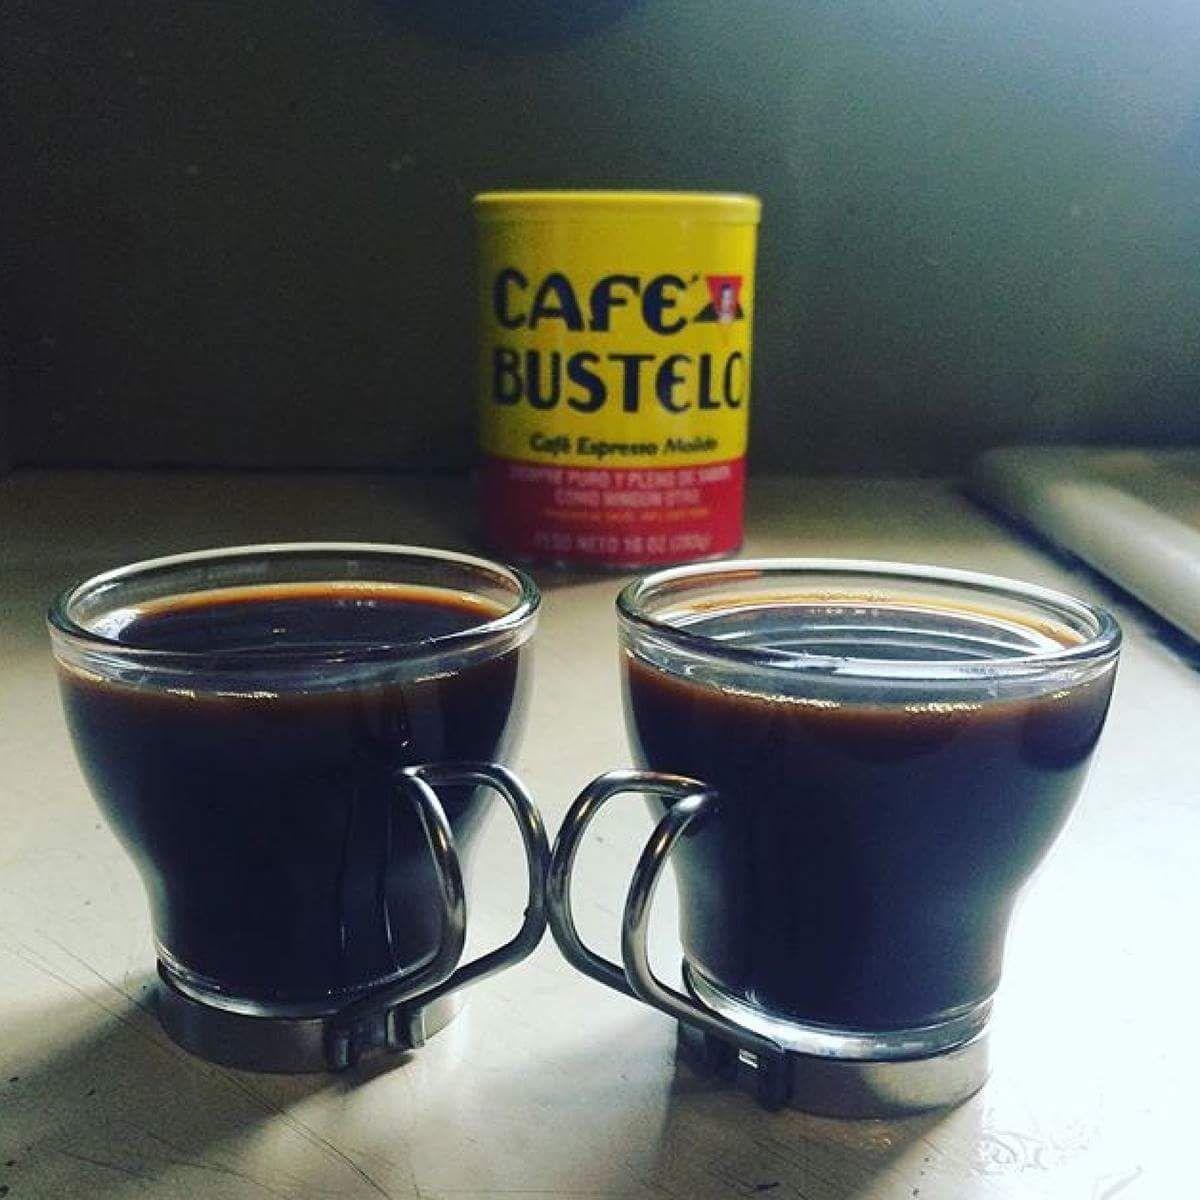 Café Bustelo Spending time over espresso with the ones